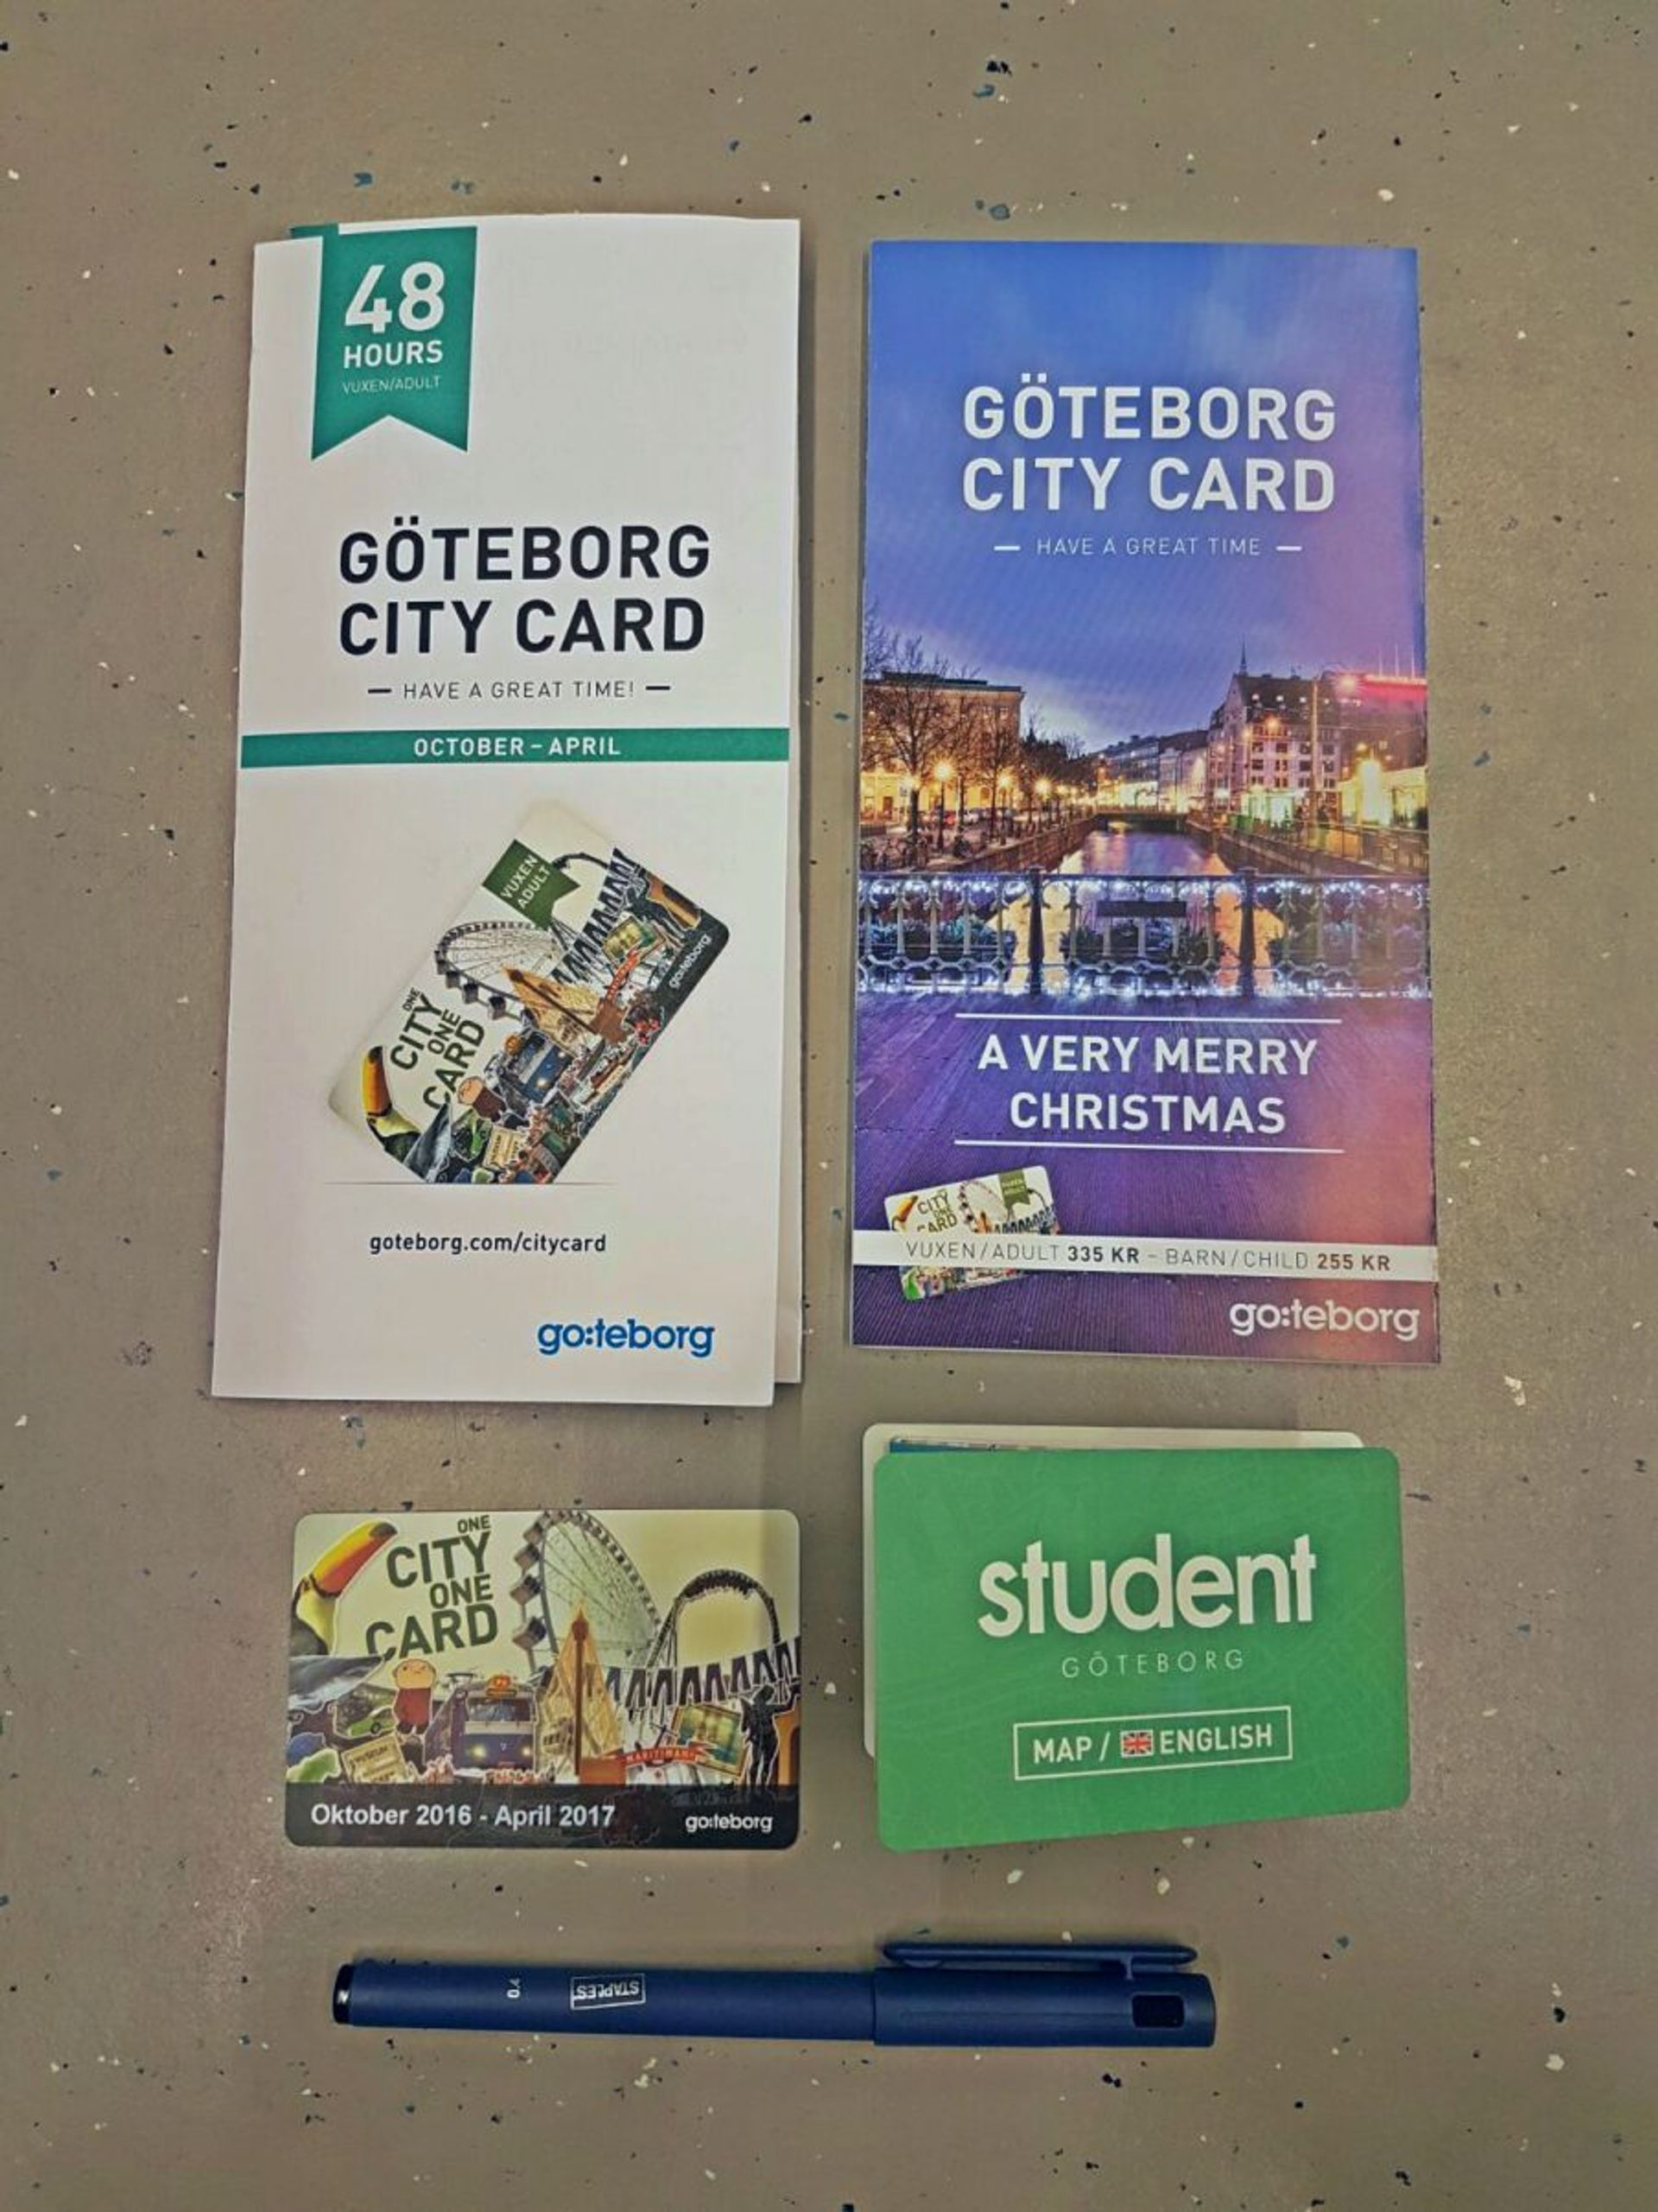 Gothenburg City Card